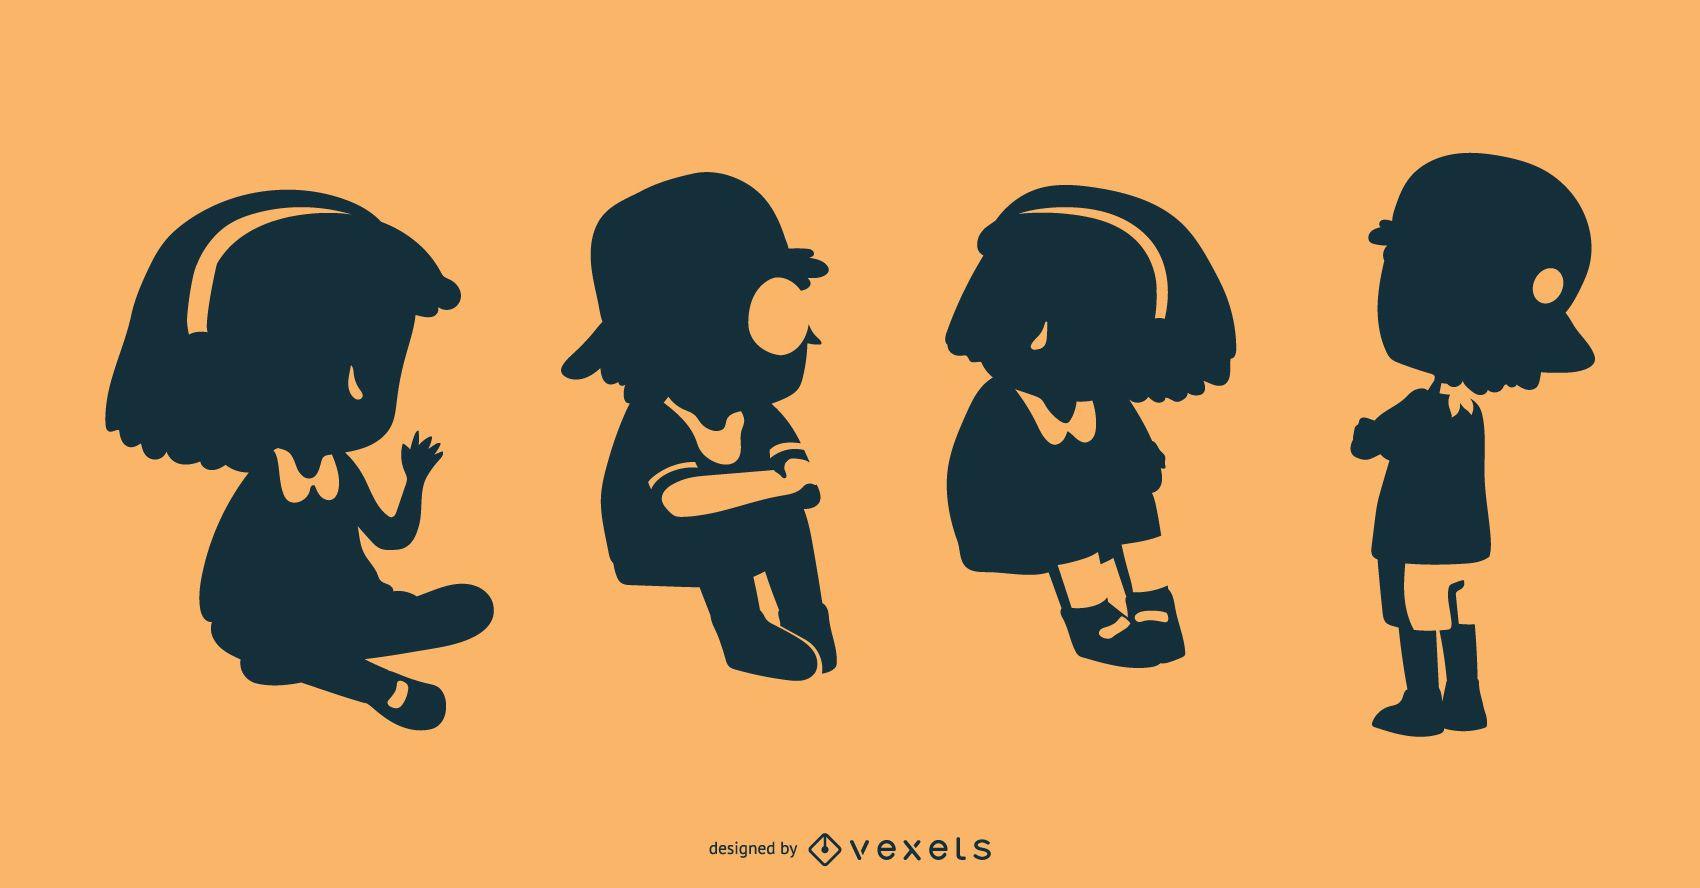 Children Silhouette Design